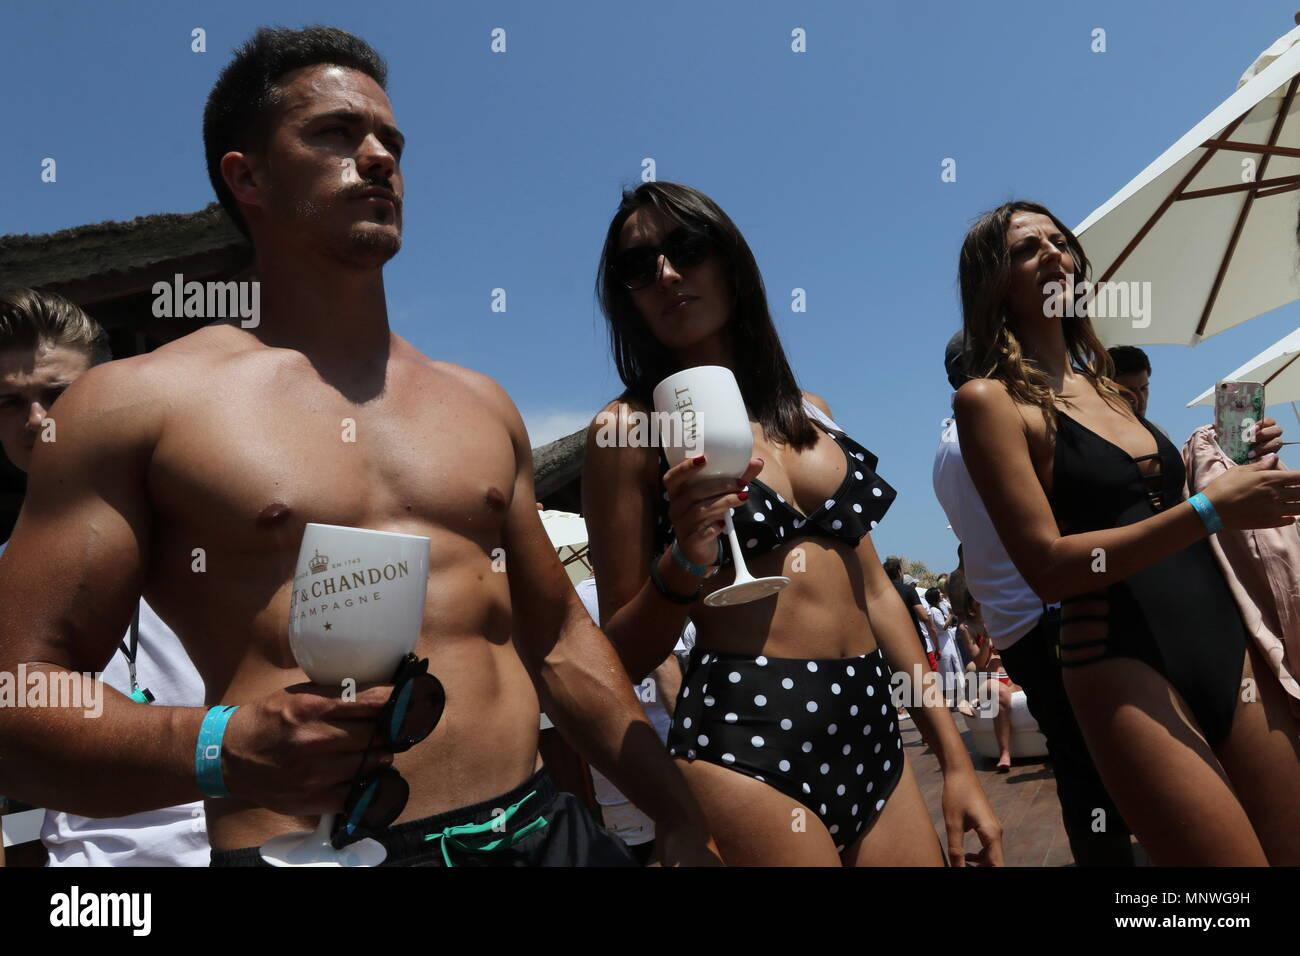 club escort girl in marbella